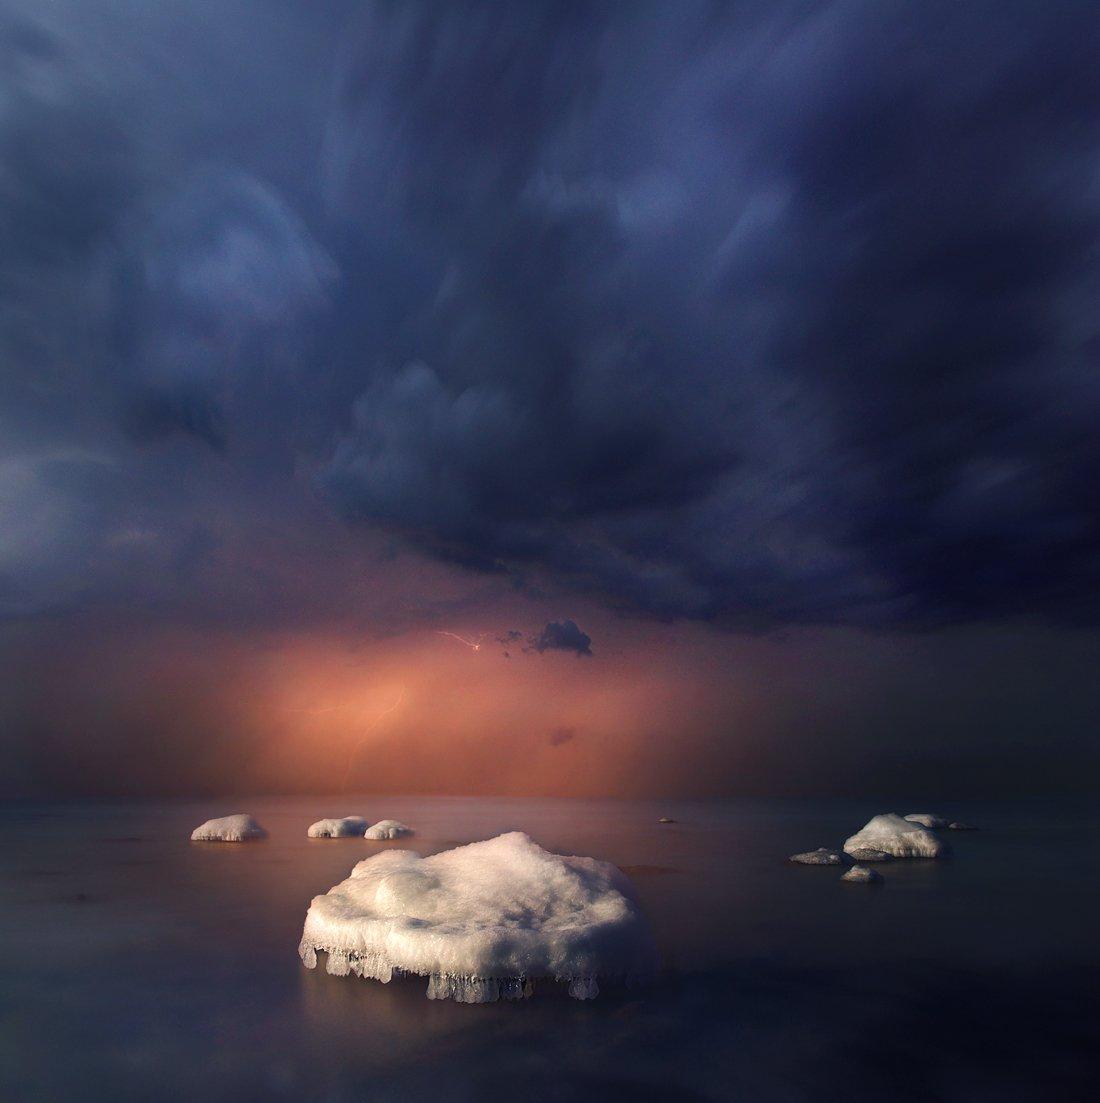 Lithuania, clouds, storm,ice,rock, sea, Mindaugas Žarys